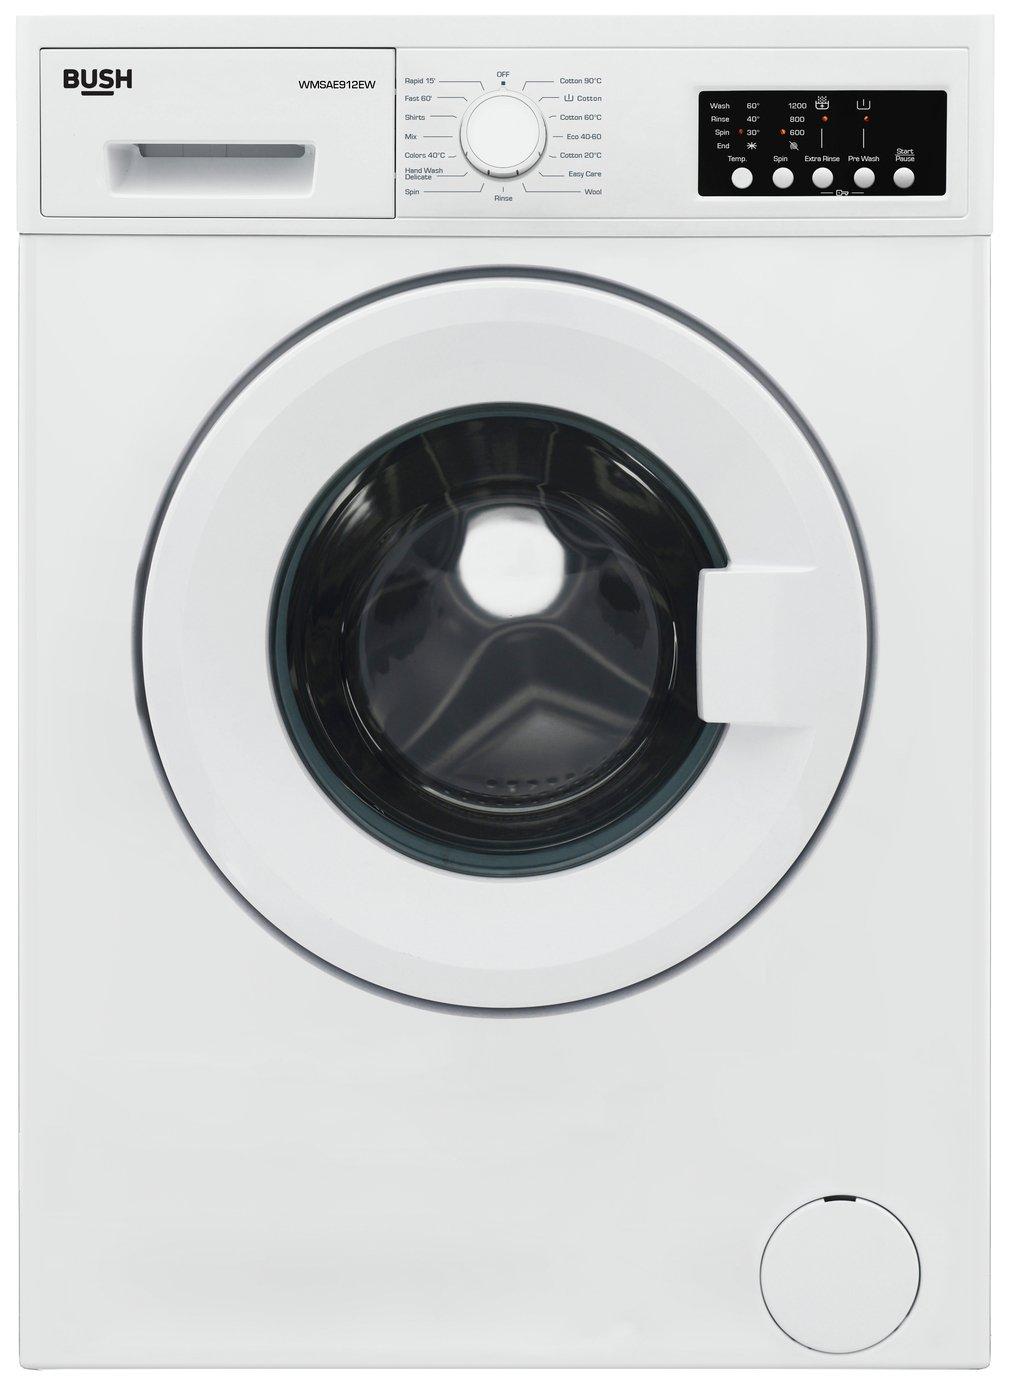 Bush WMSAE912EW 9KG 1200 Spin Washing Machine